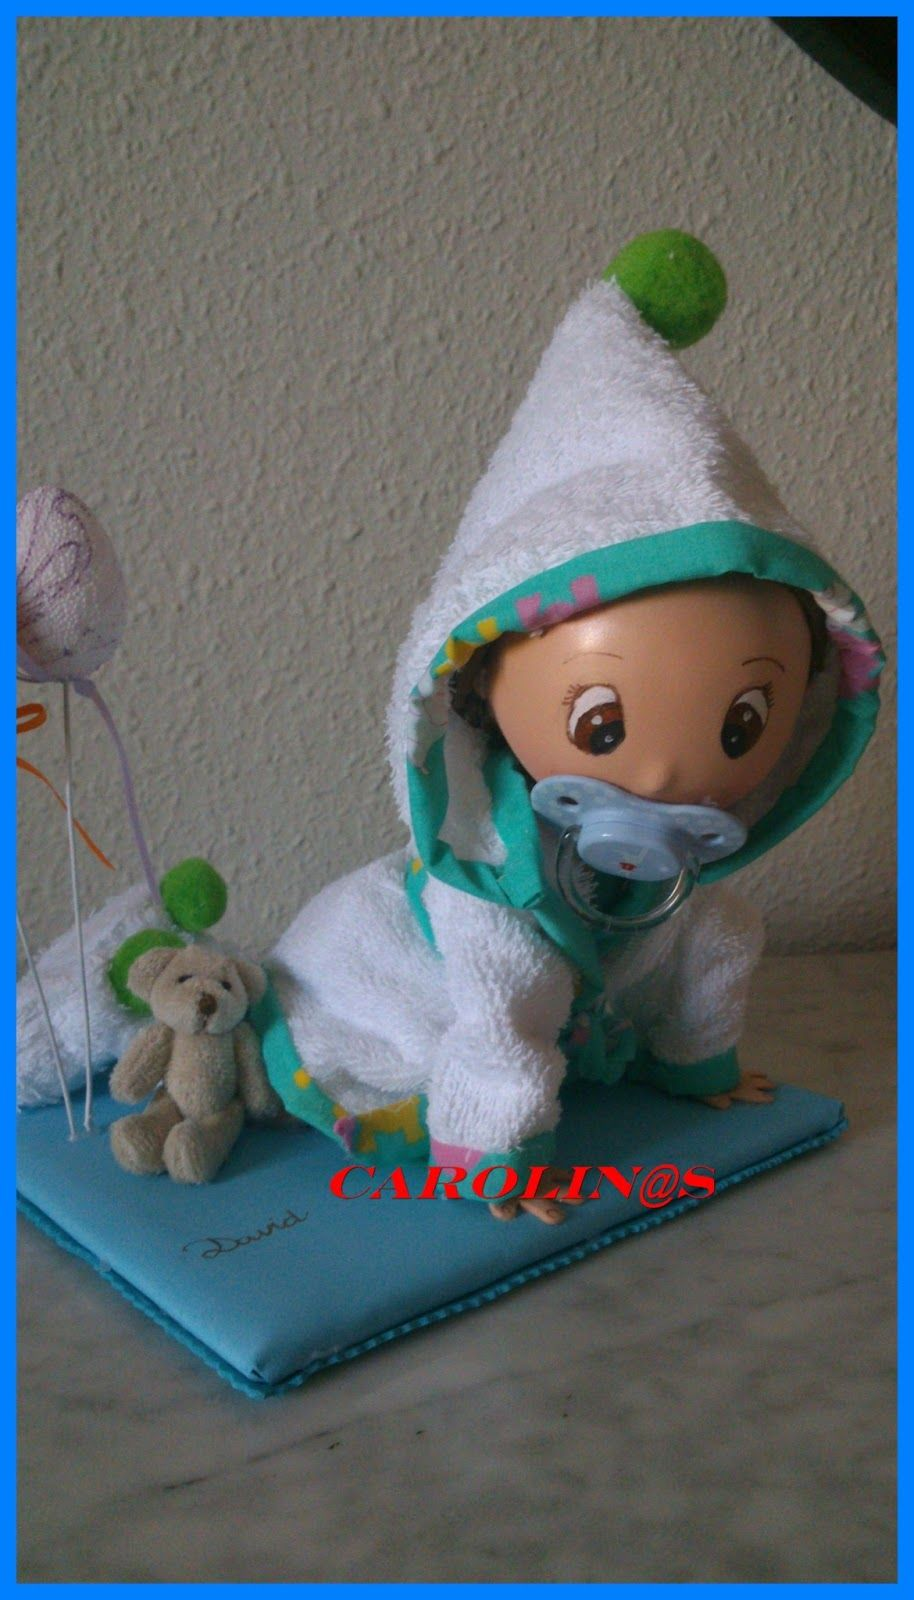 Fofuchas Carolin At S Un Bebe Muy Especial Manualidades Pinterest - Bebe-de-goma-eva